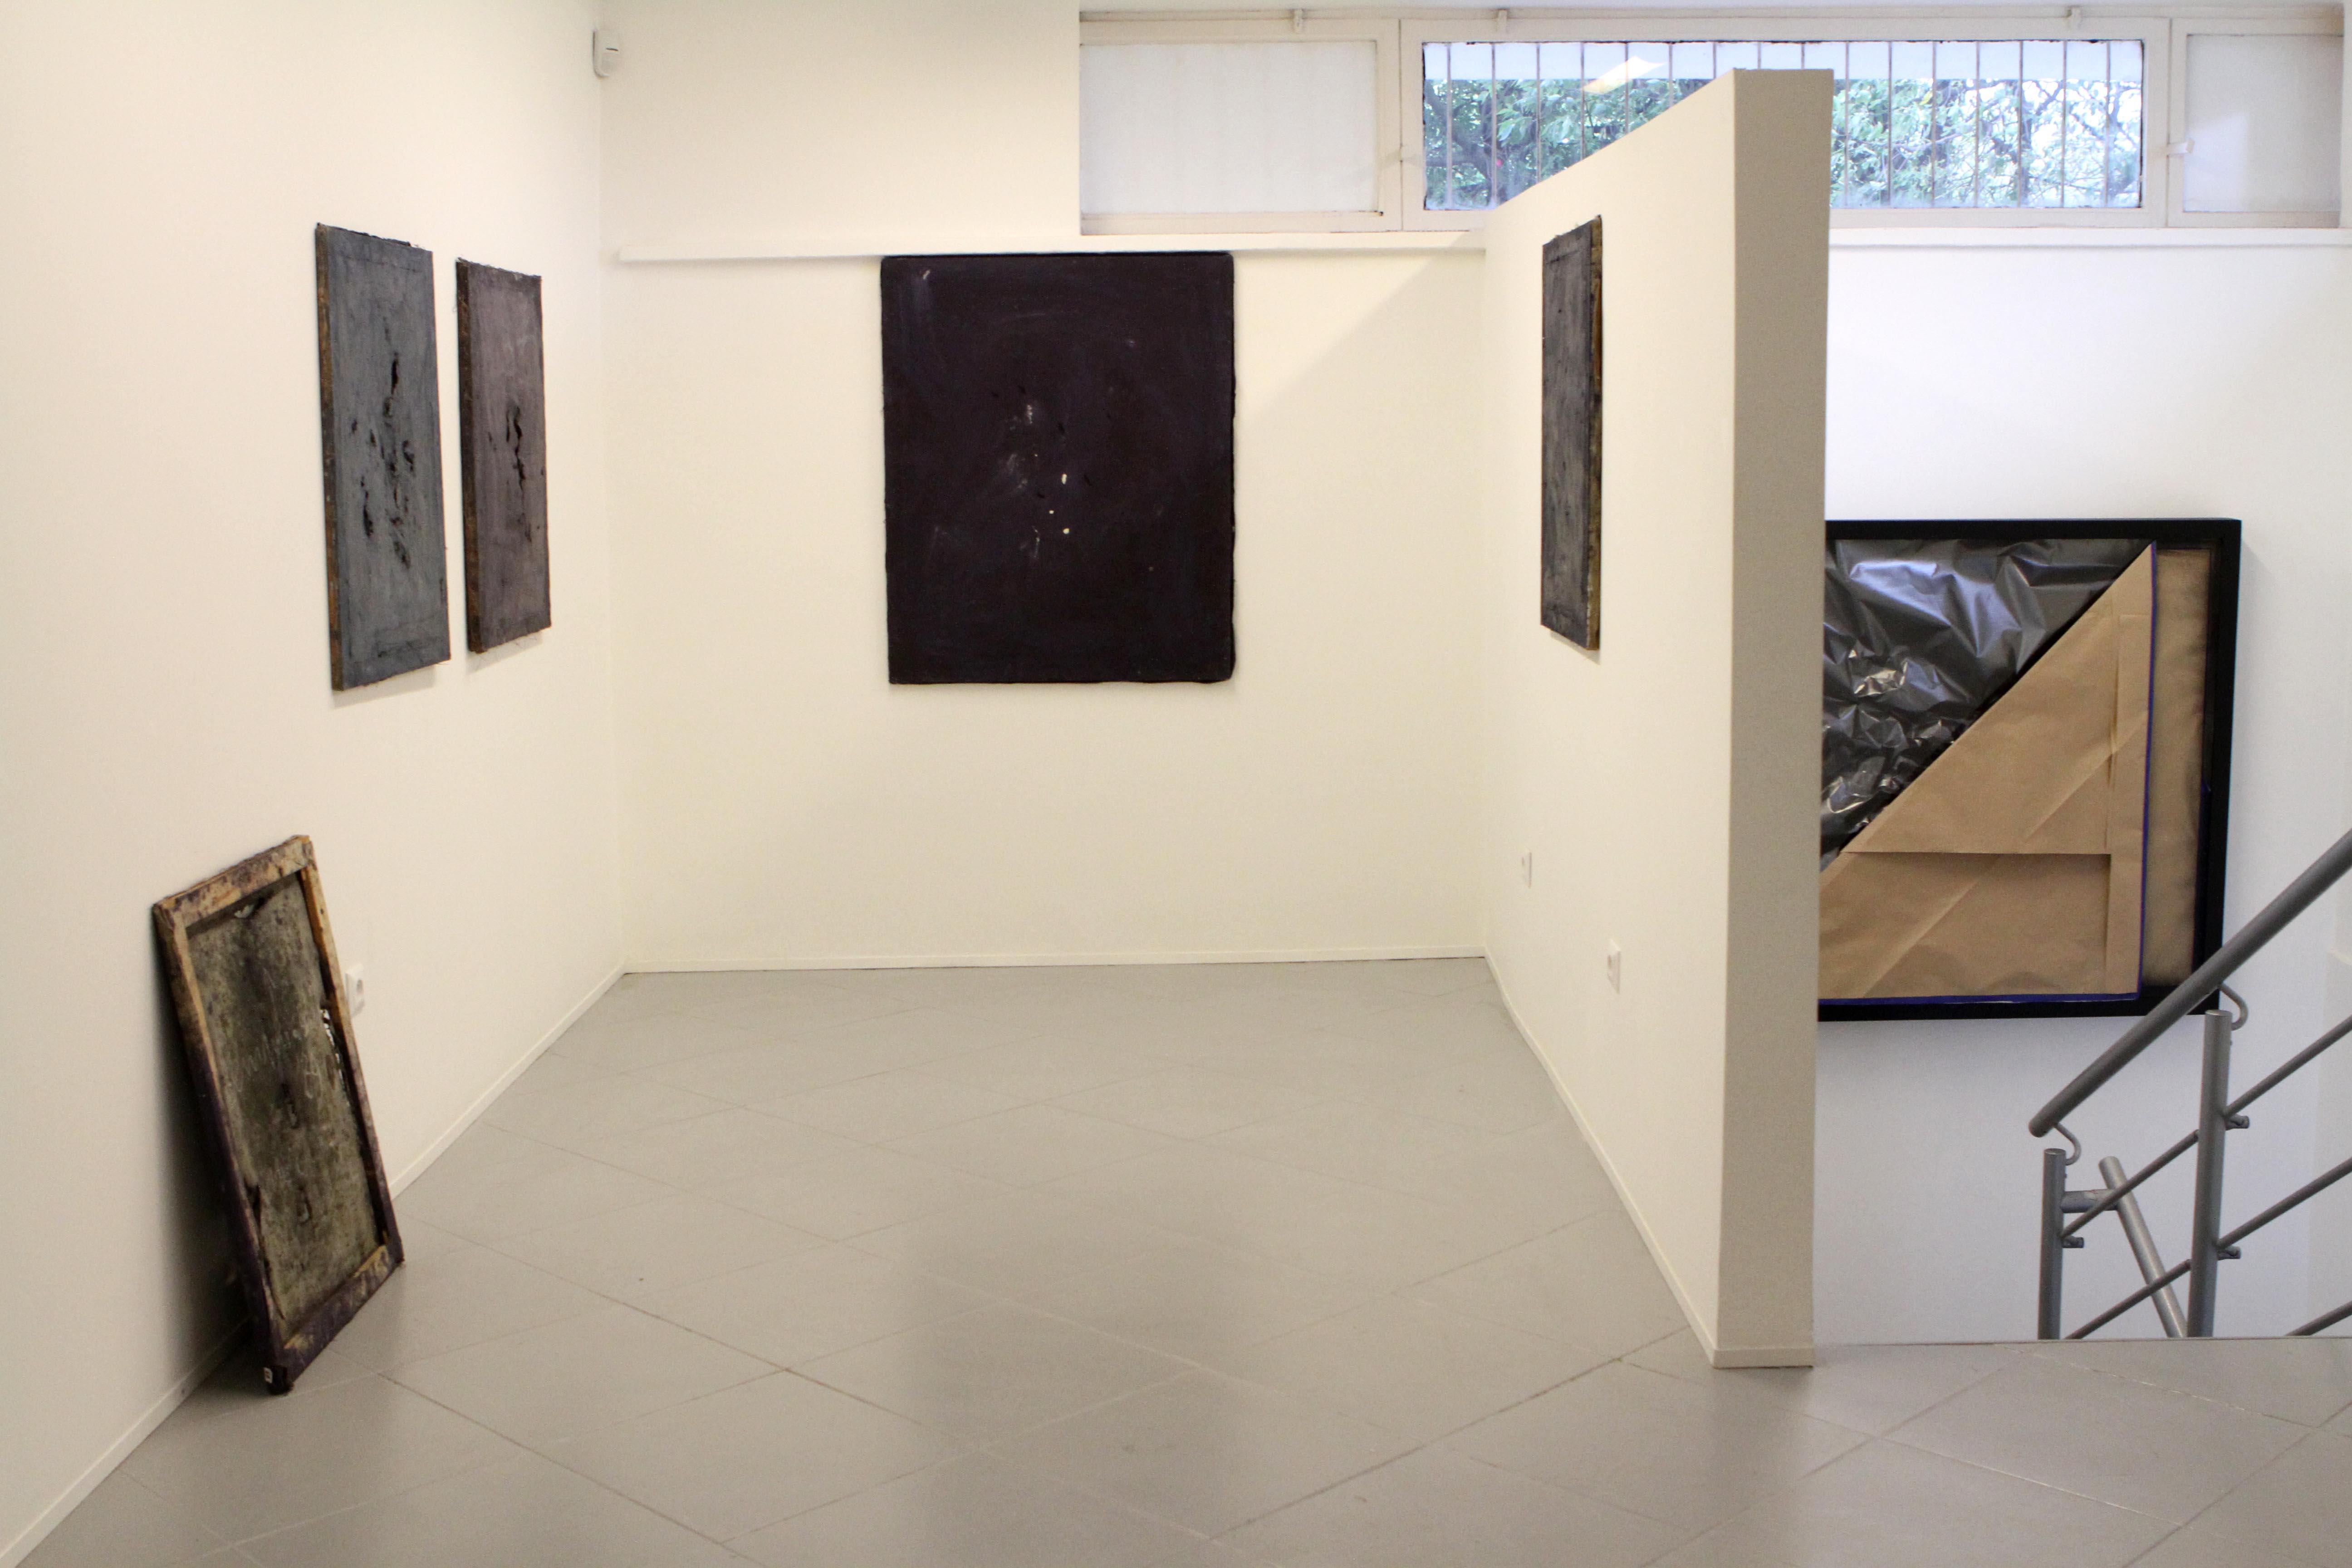 Obiektu dla Obrazu już niema, Galeria Monopol, fot.Leszek Fidusiewicz